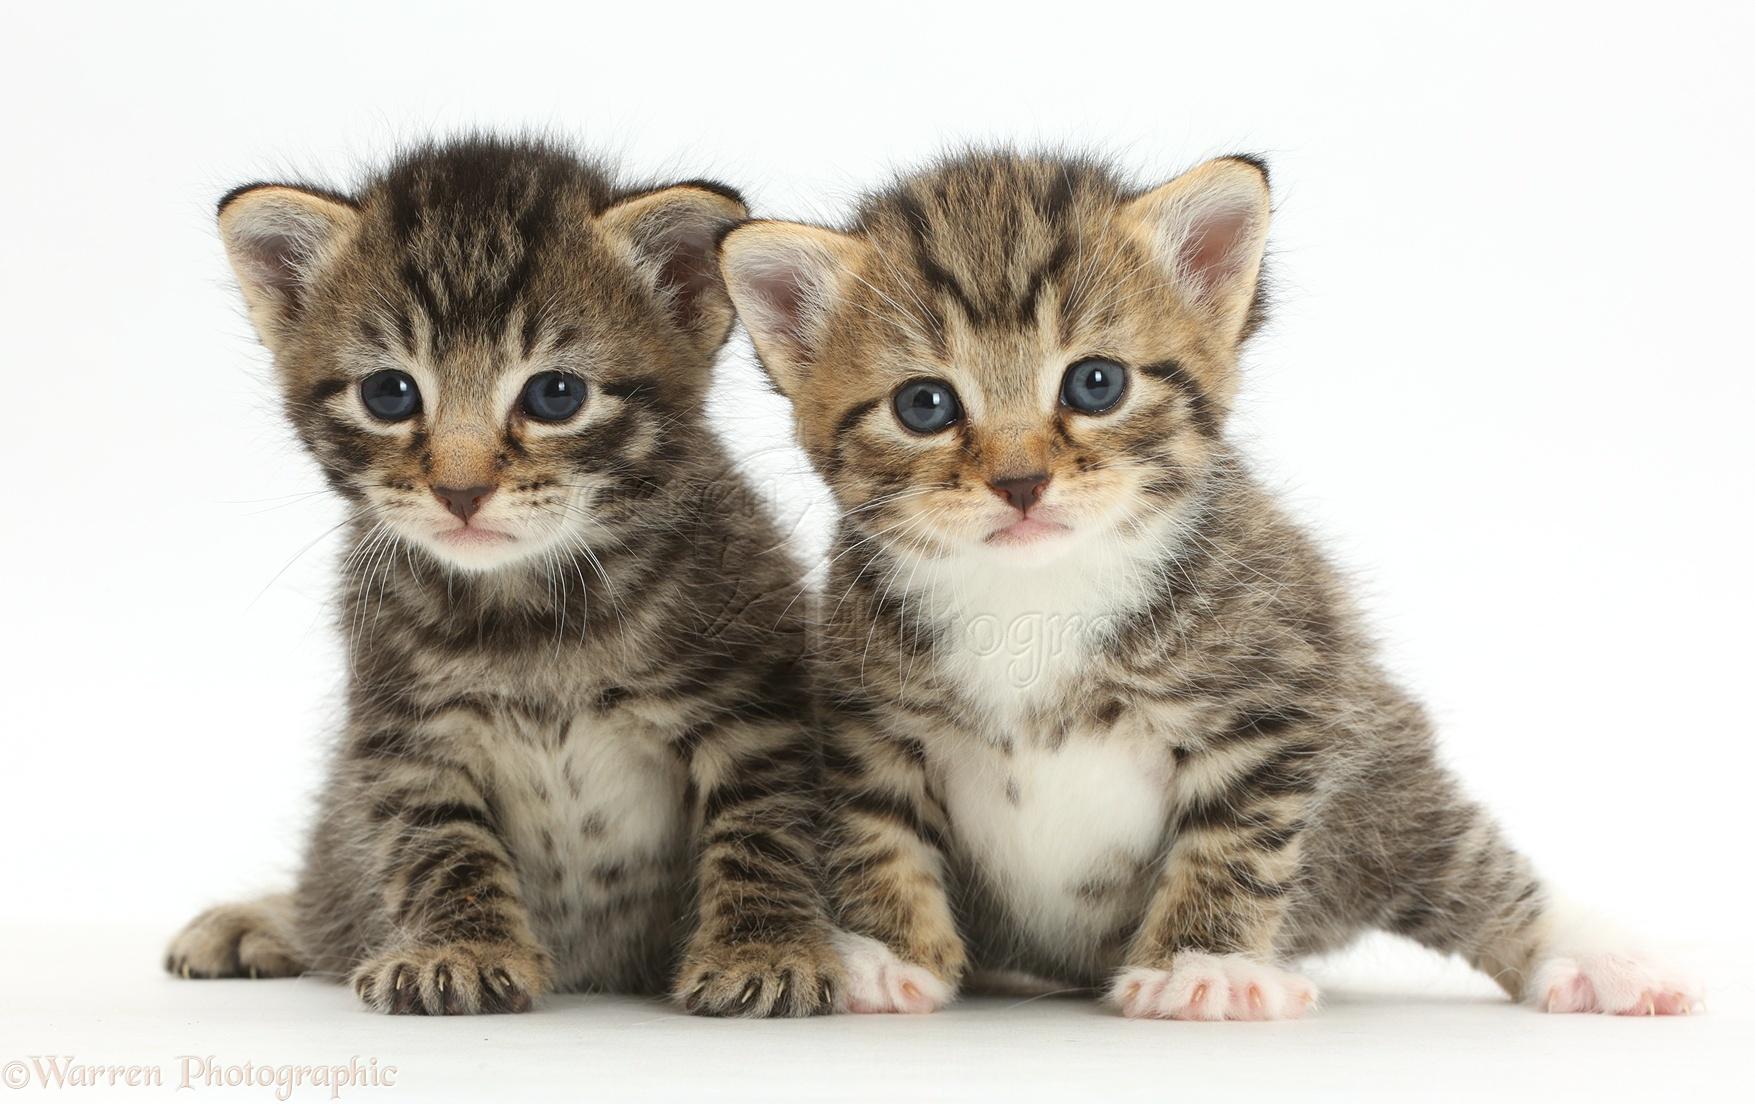 Cute baby tabby kittens photo WP